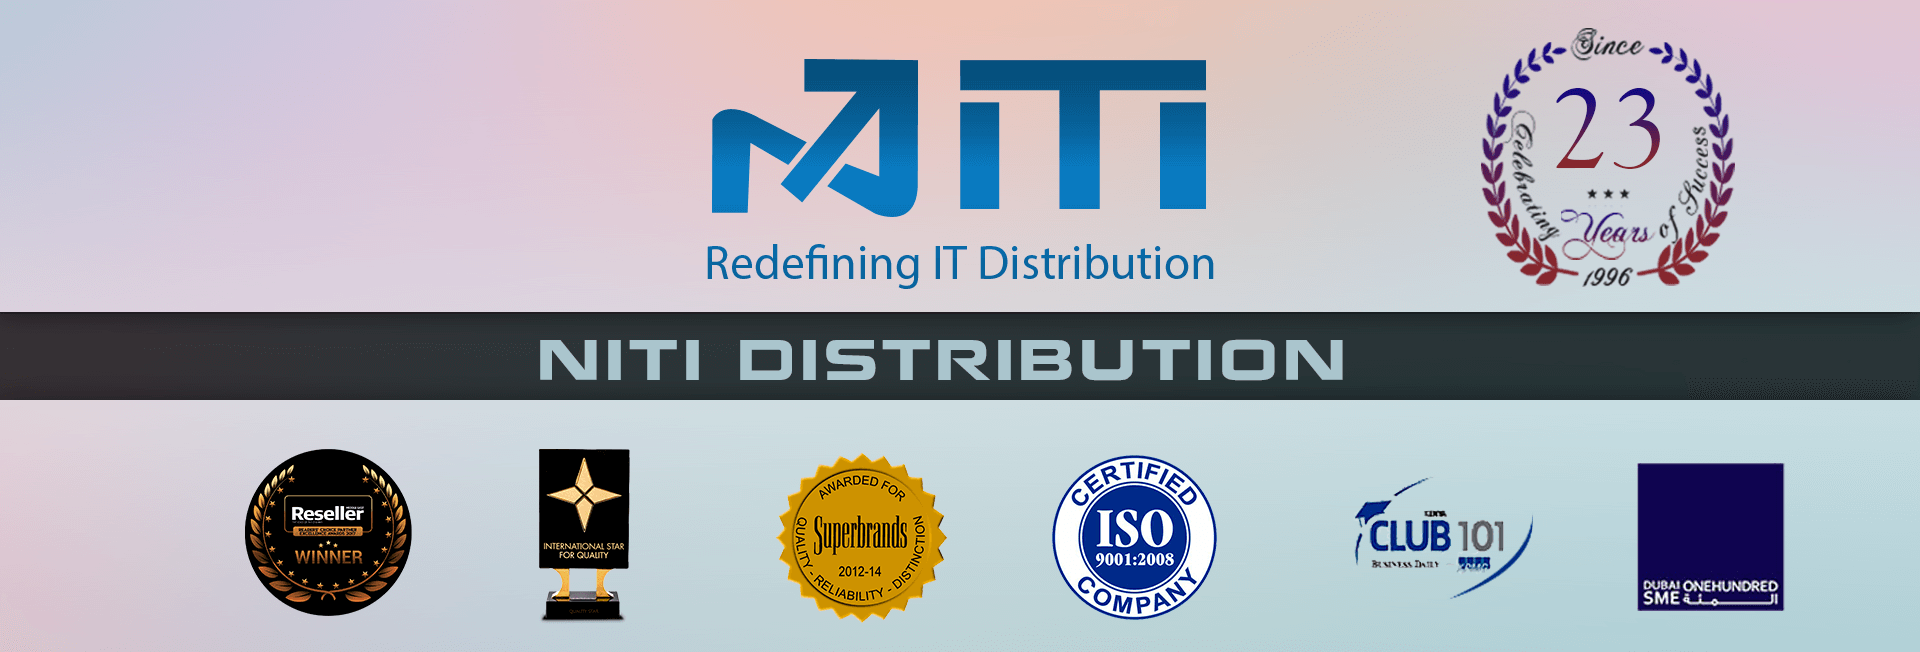 Niti Distributions – Redefining IT Distribution